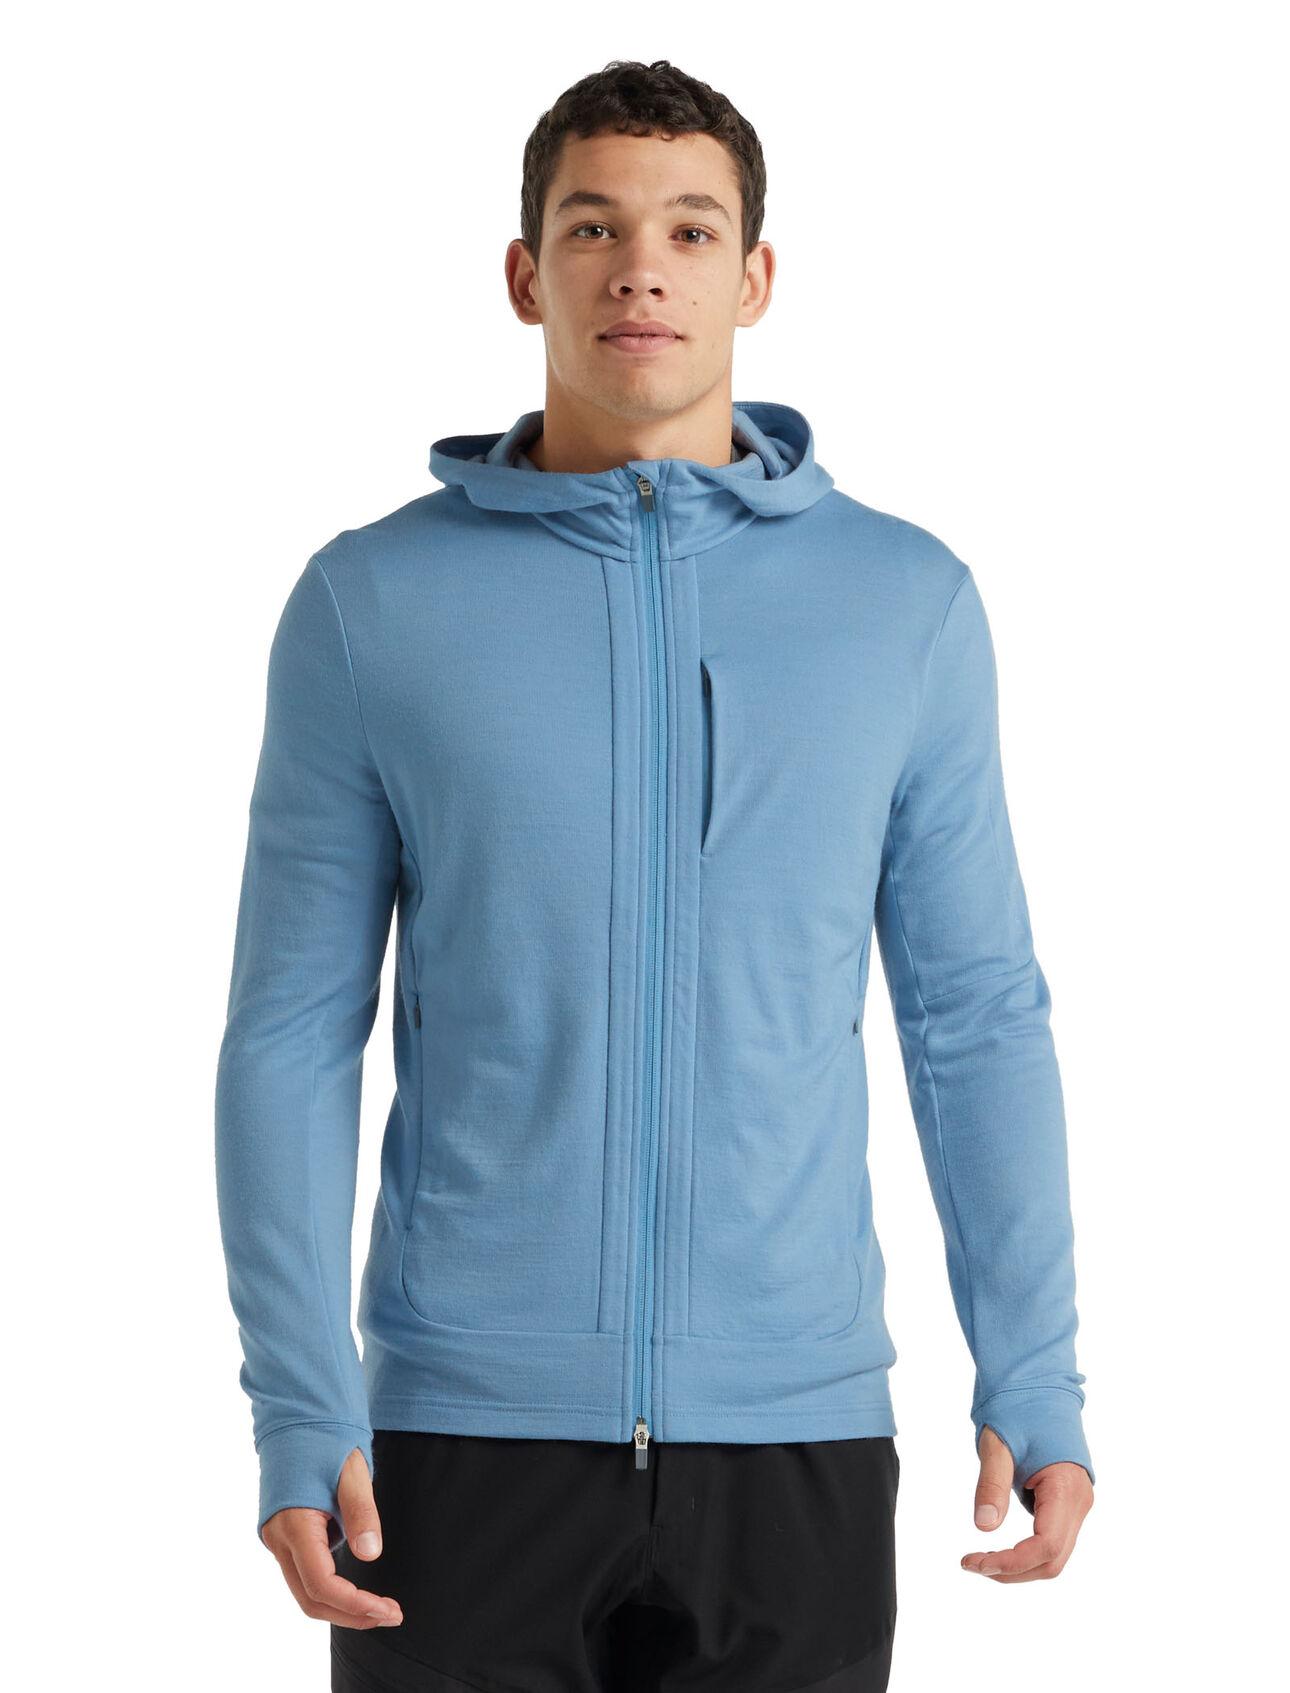 Merino Quantum III Long Sleeve Zip Hoodie